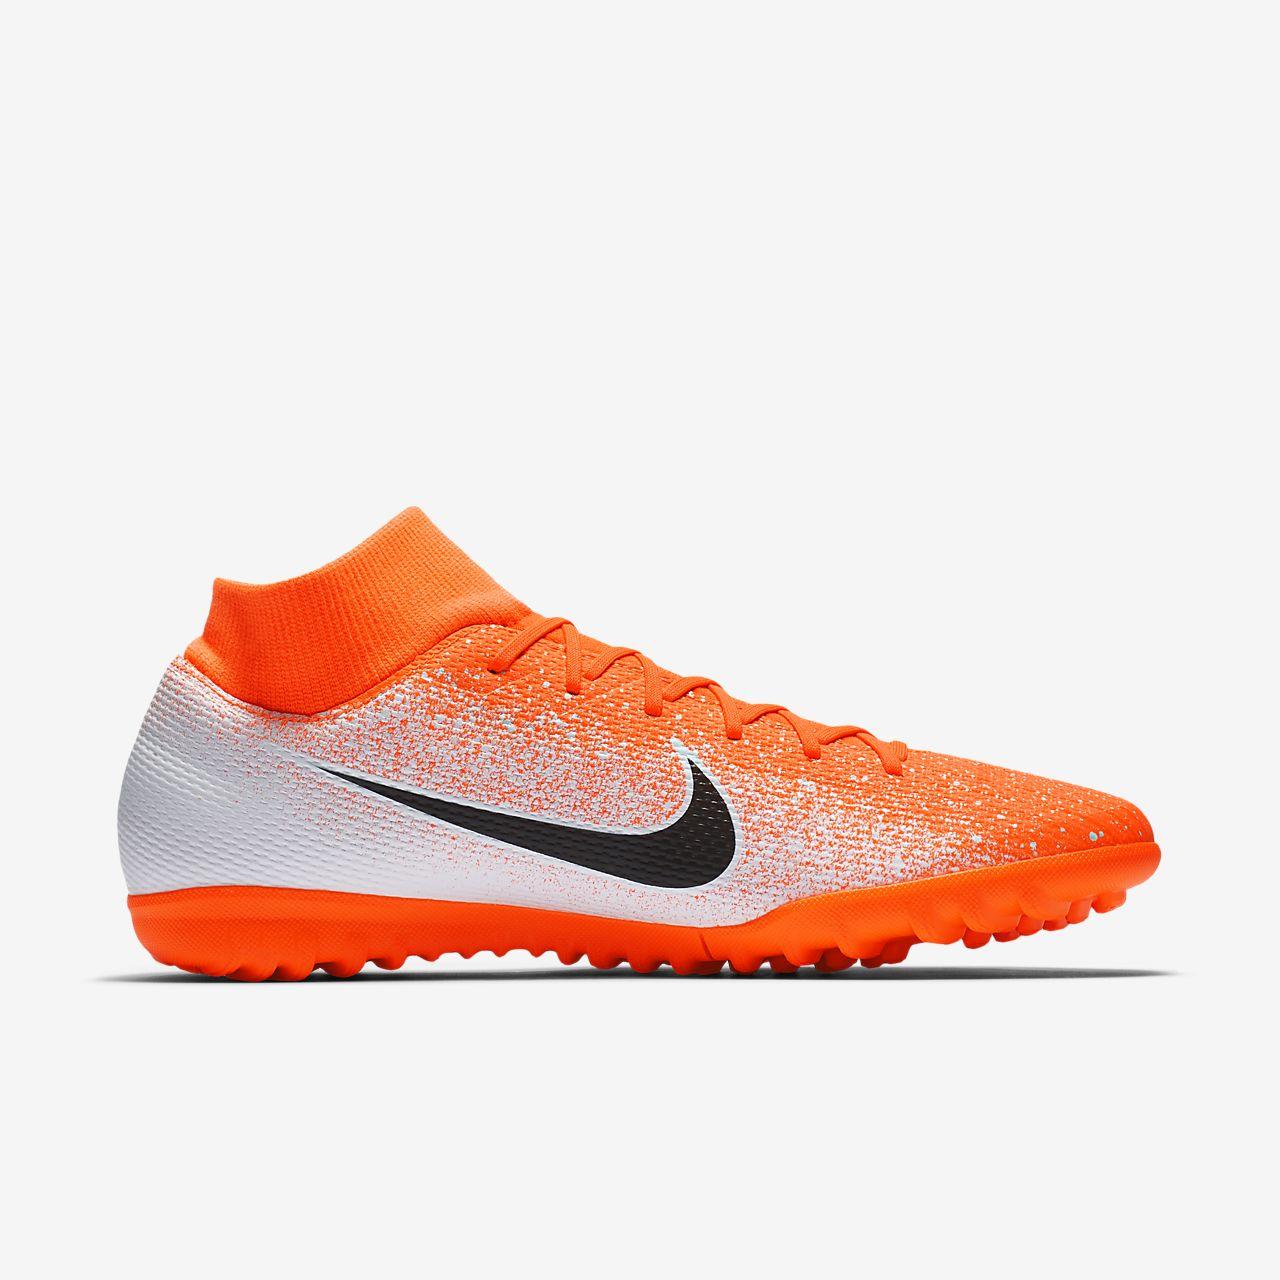 buy online 0581b 12023 Nike SuperflyX 6 Academy TF Turf Football Boot